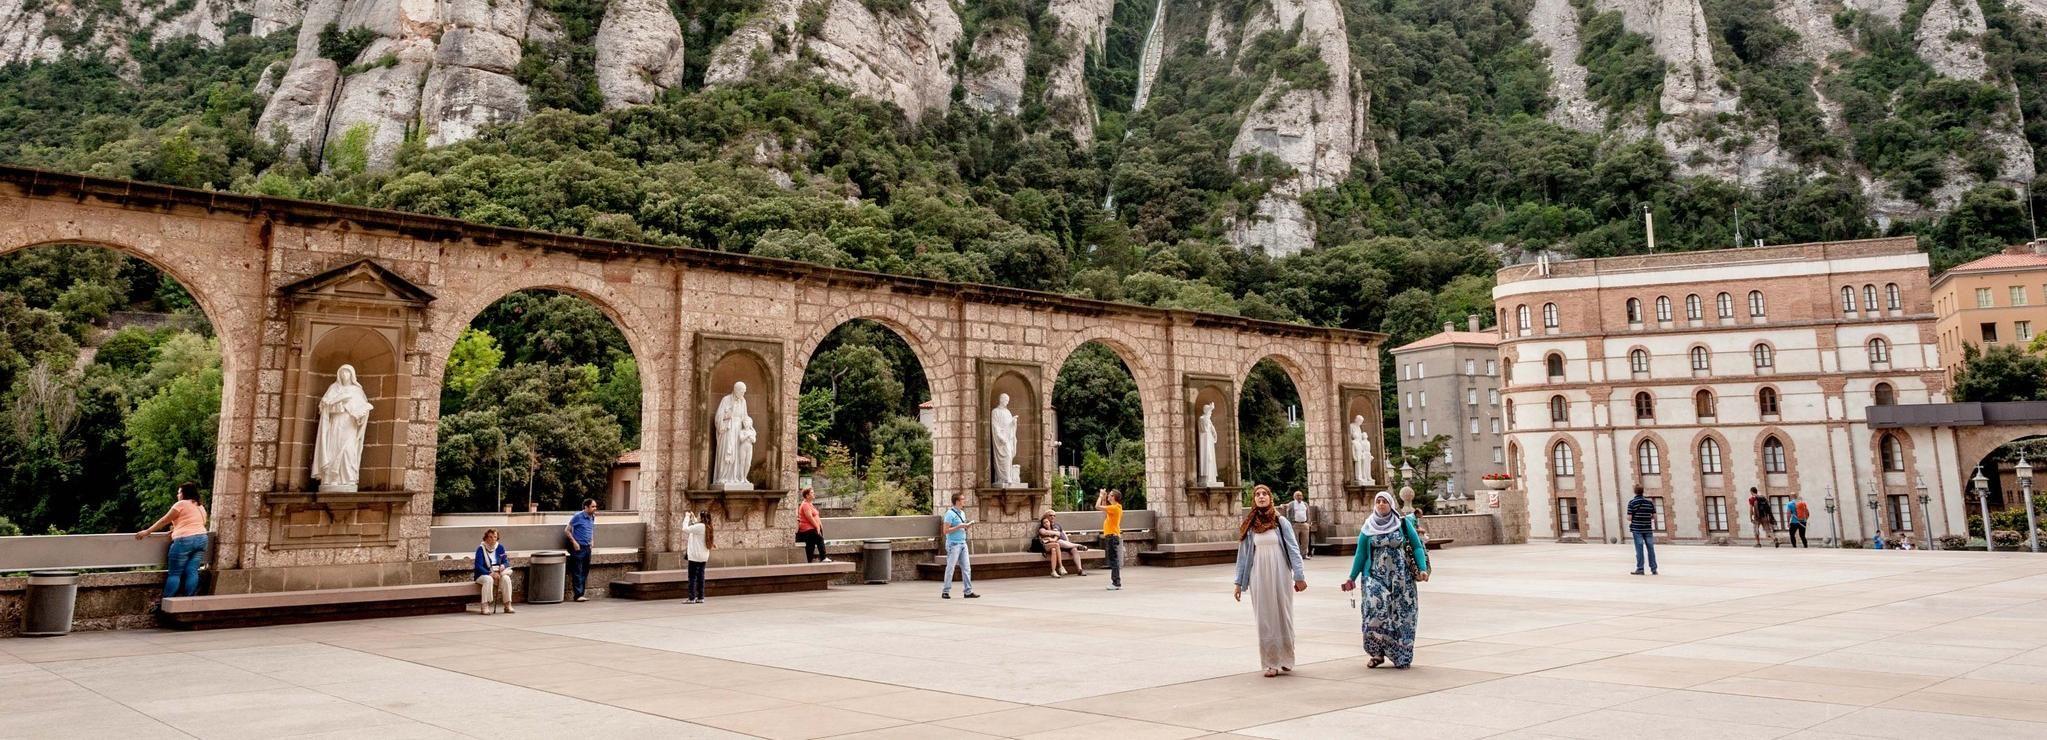 The Montserrat Tour from Barcelona